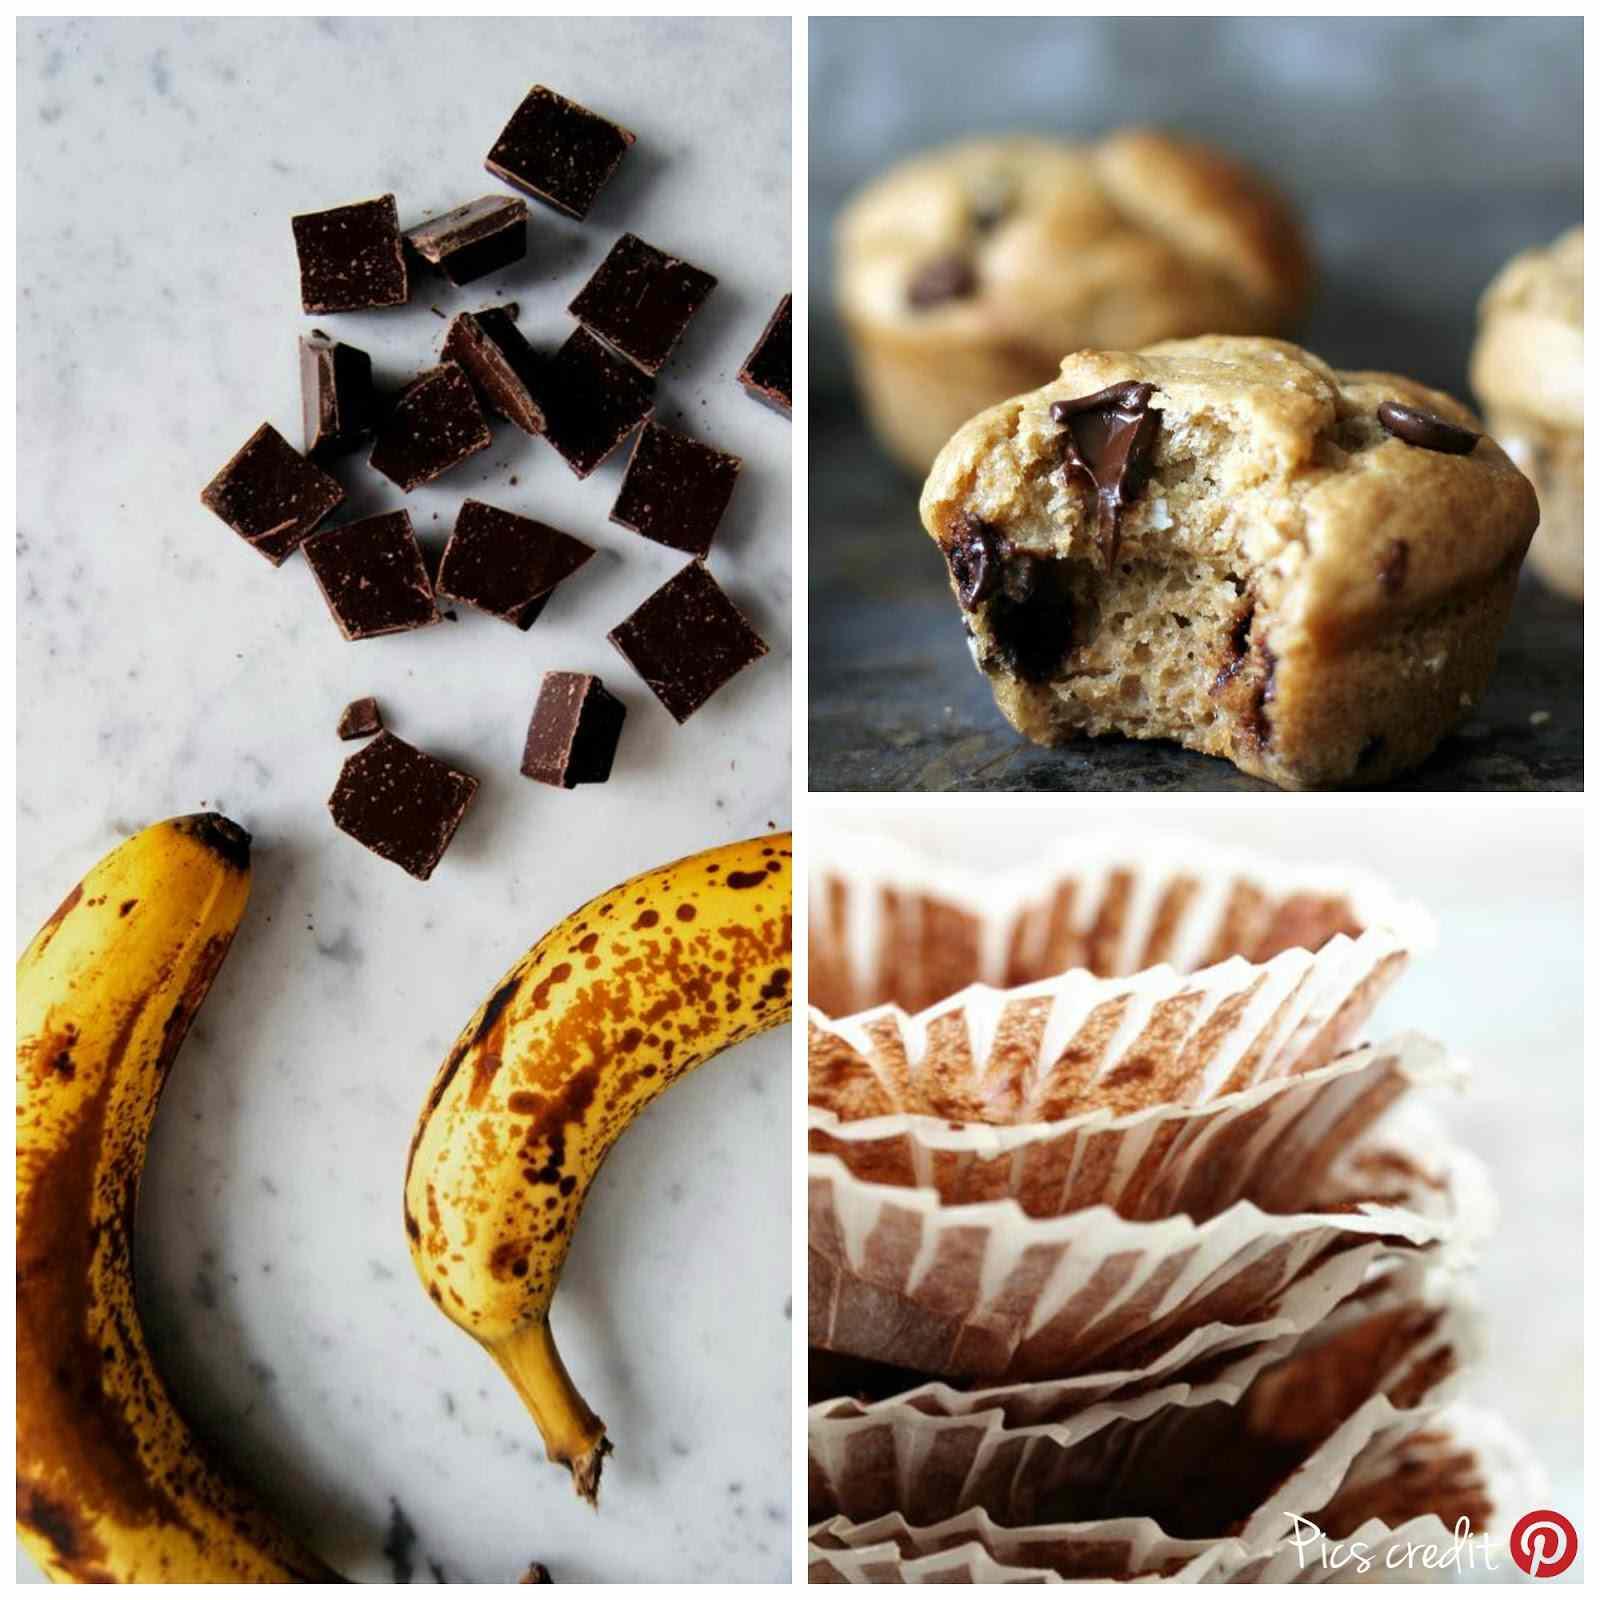 Ricetta: Muffins cioccolato e banana / choco  banana muffins recipe